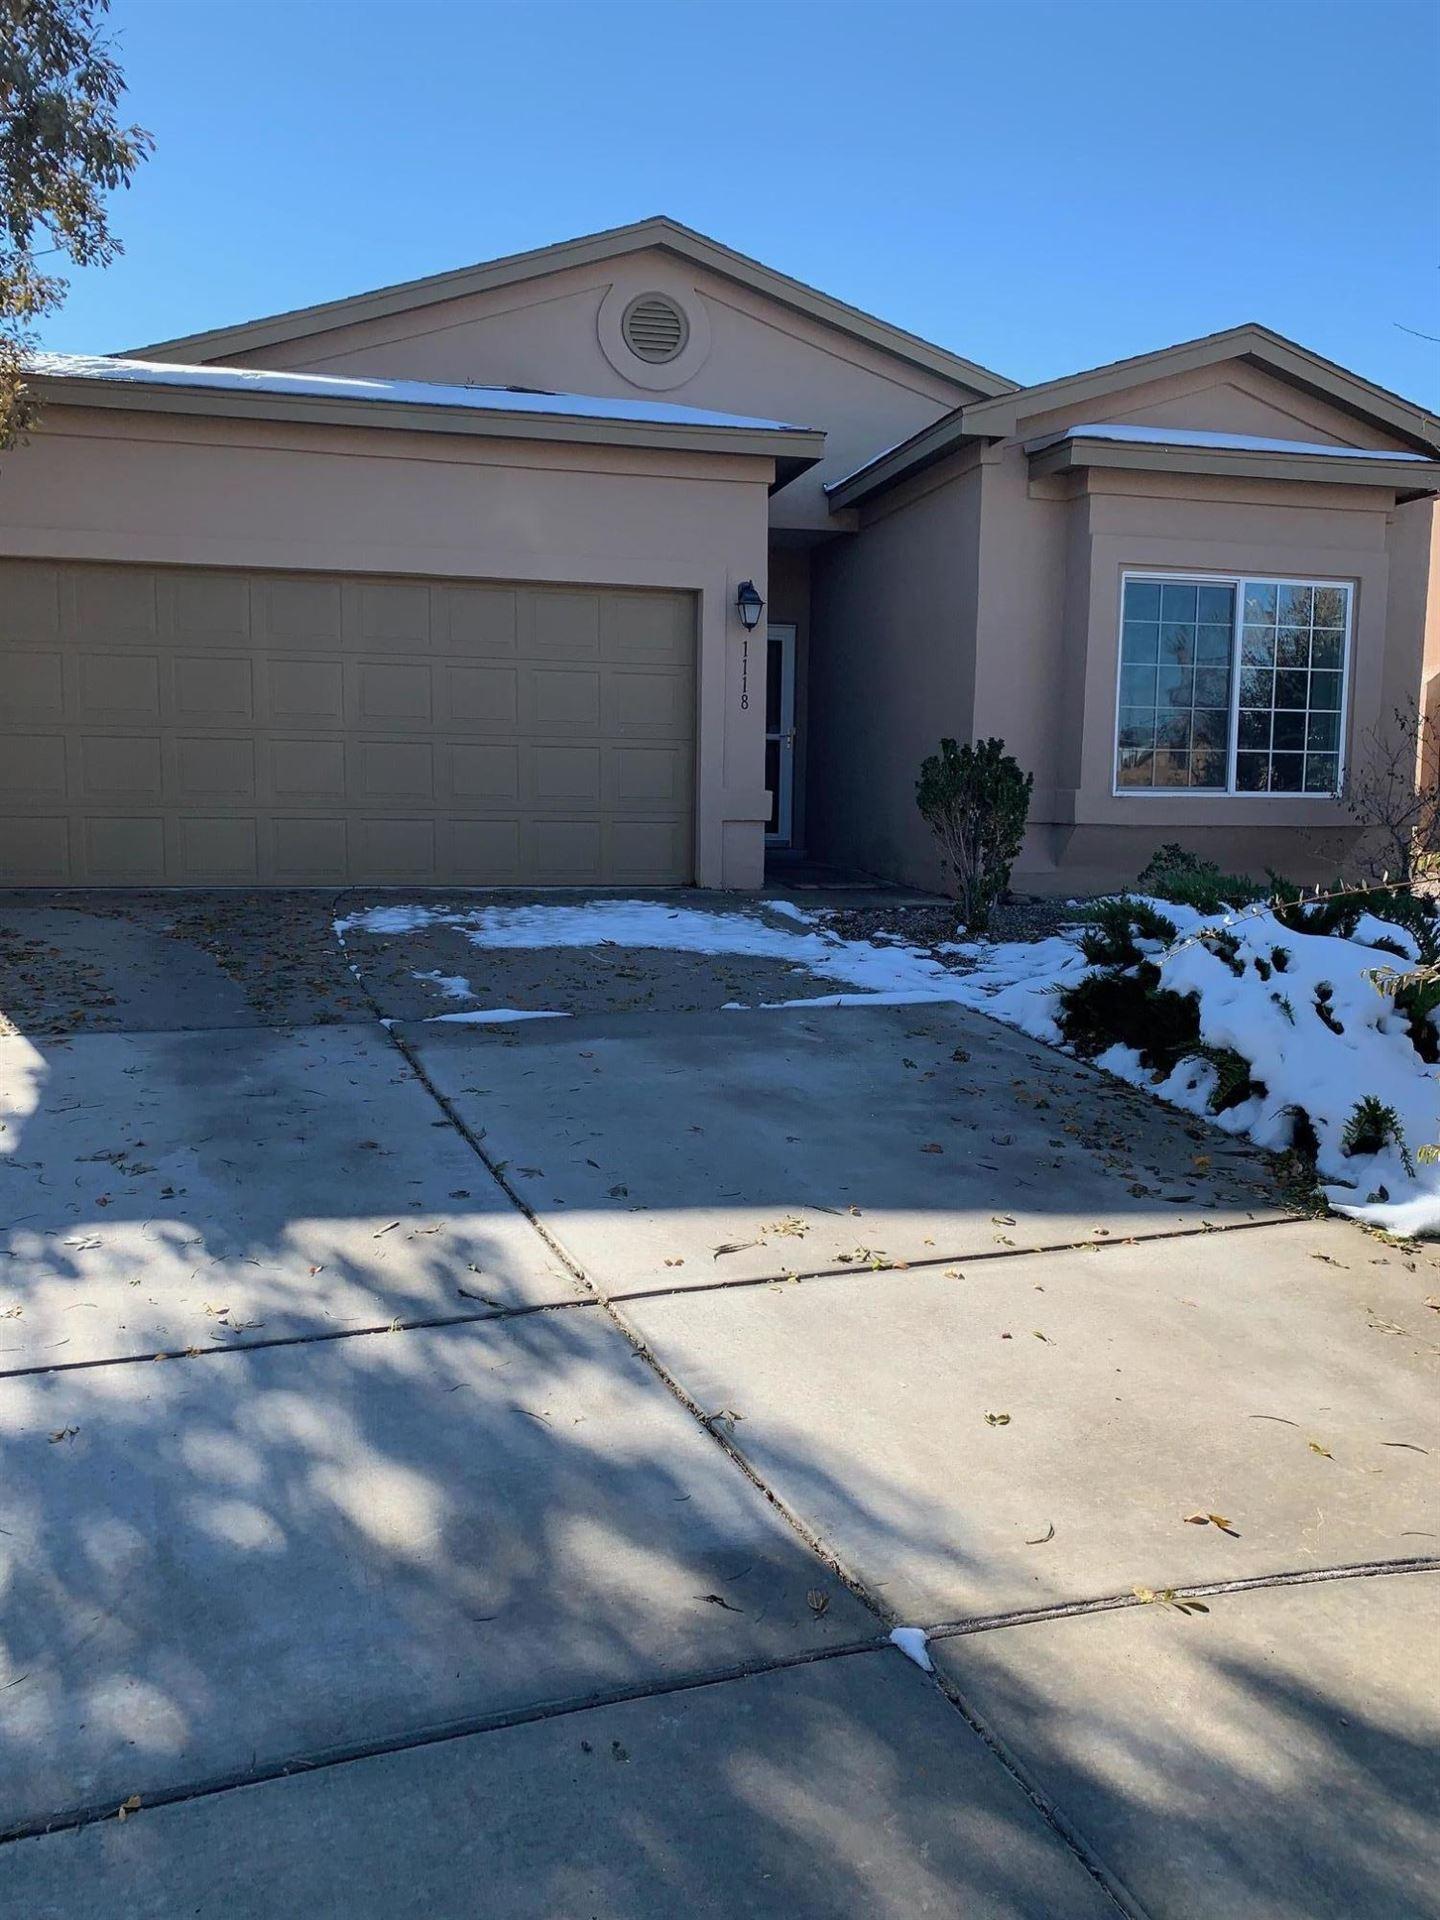 Photo of 1118 DESERT SUNFLOWER Drive NE, Rio Rancho, NM 87144 (MLS # 980130)